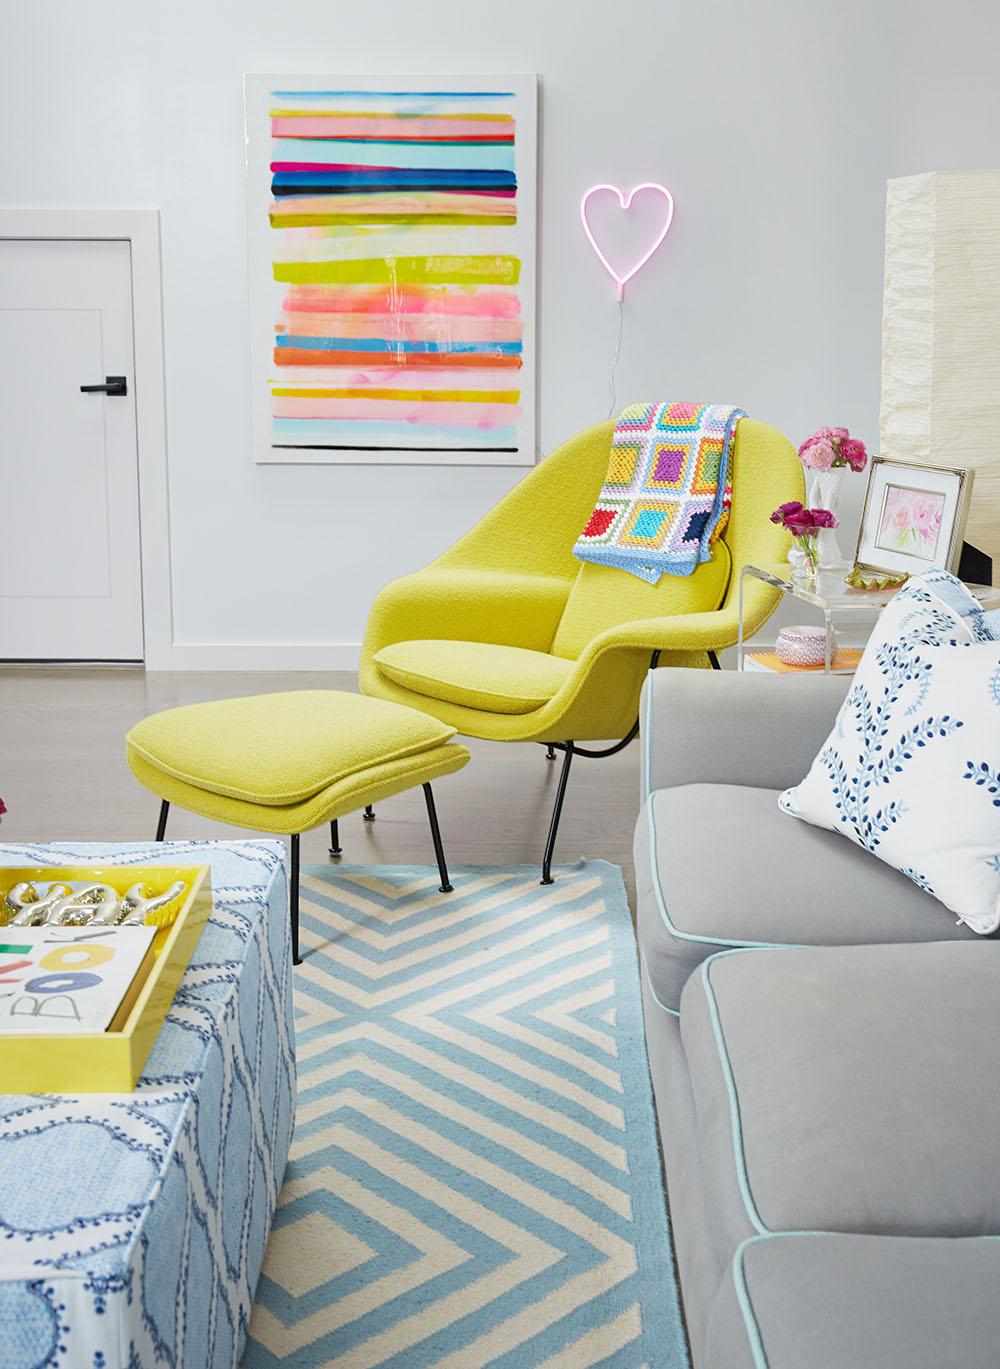 Mimosa-Lane-Blog-GeeGee-Collins-Womb-Chair-Design-Within-Reach-John-Robshaw.jpg